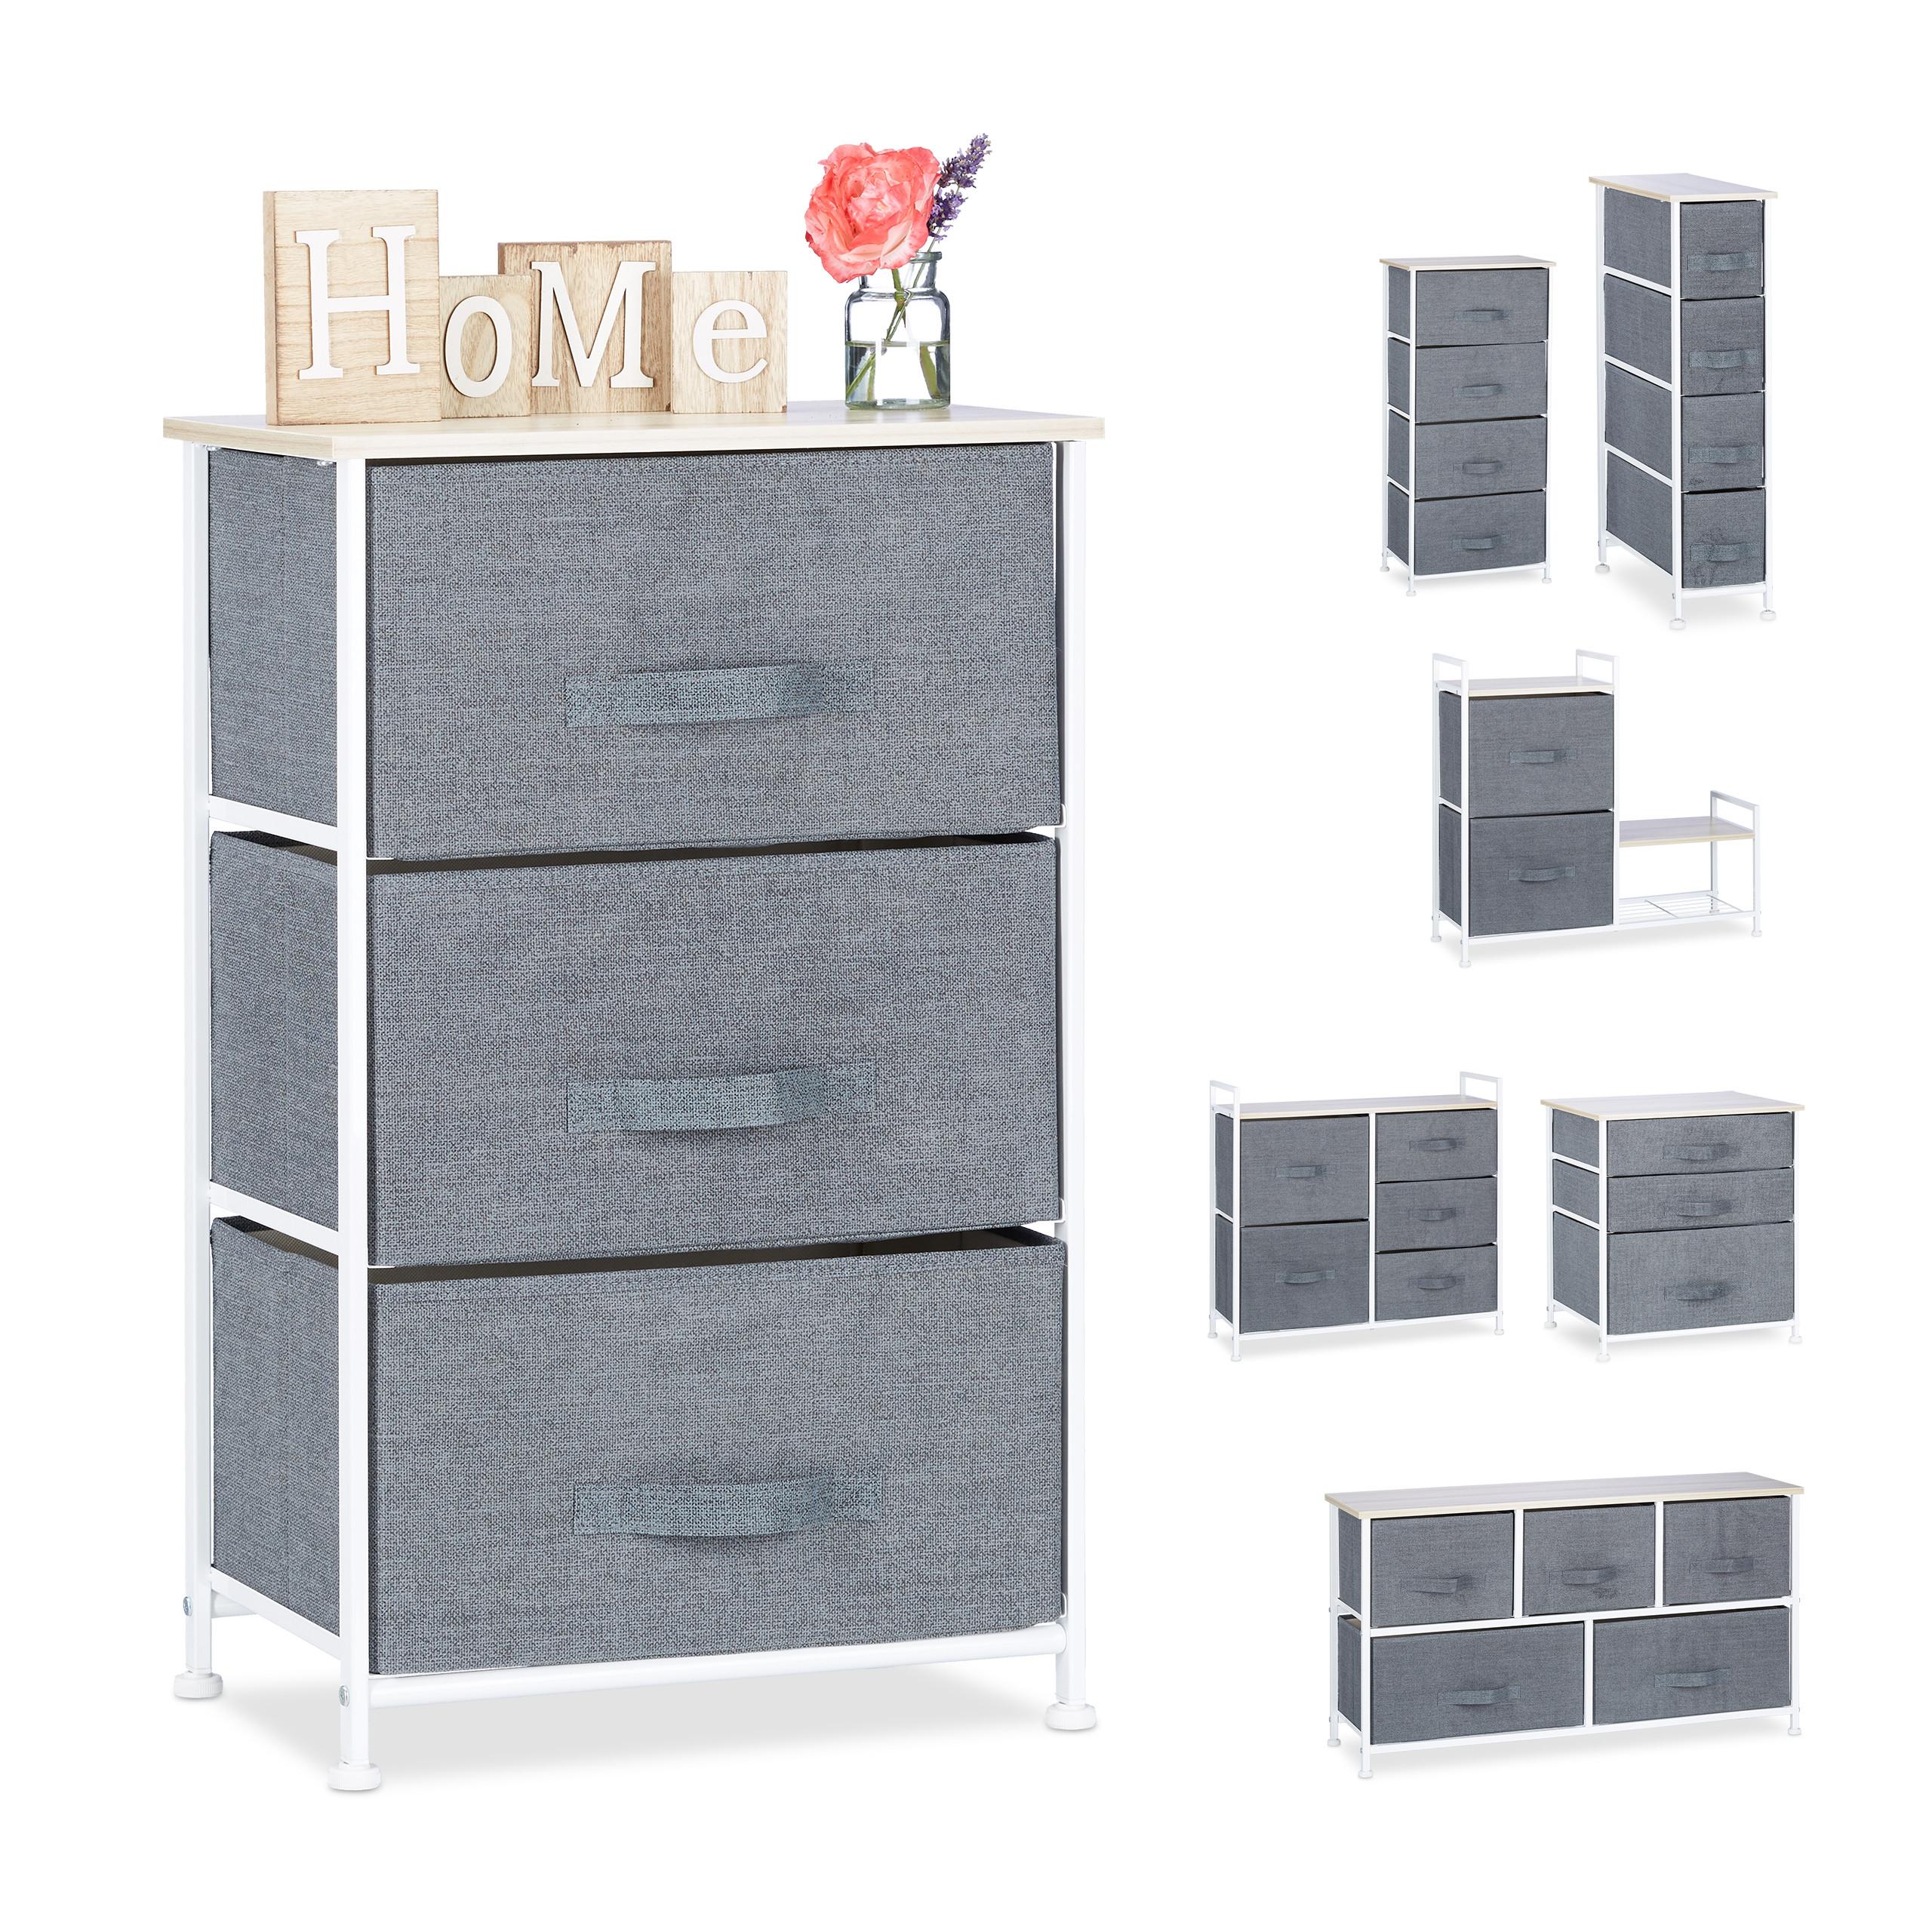 Details About Shelving System Metal Schubladenbox Shelf Dresser Shelf Drawers Grey Baskets Show Original Title